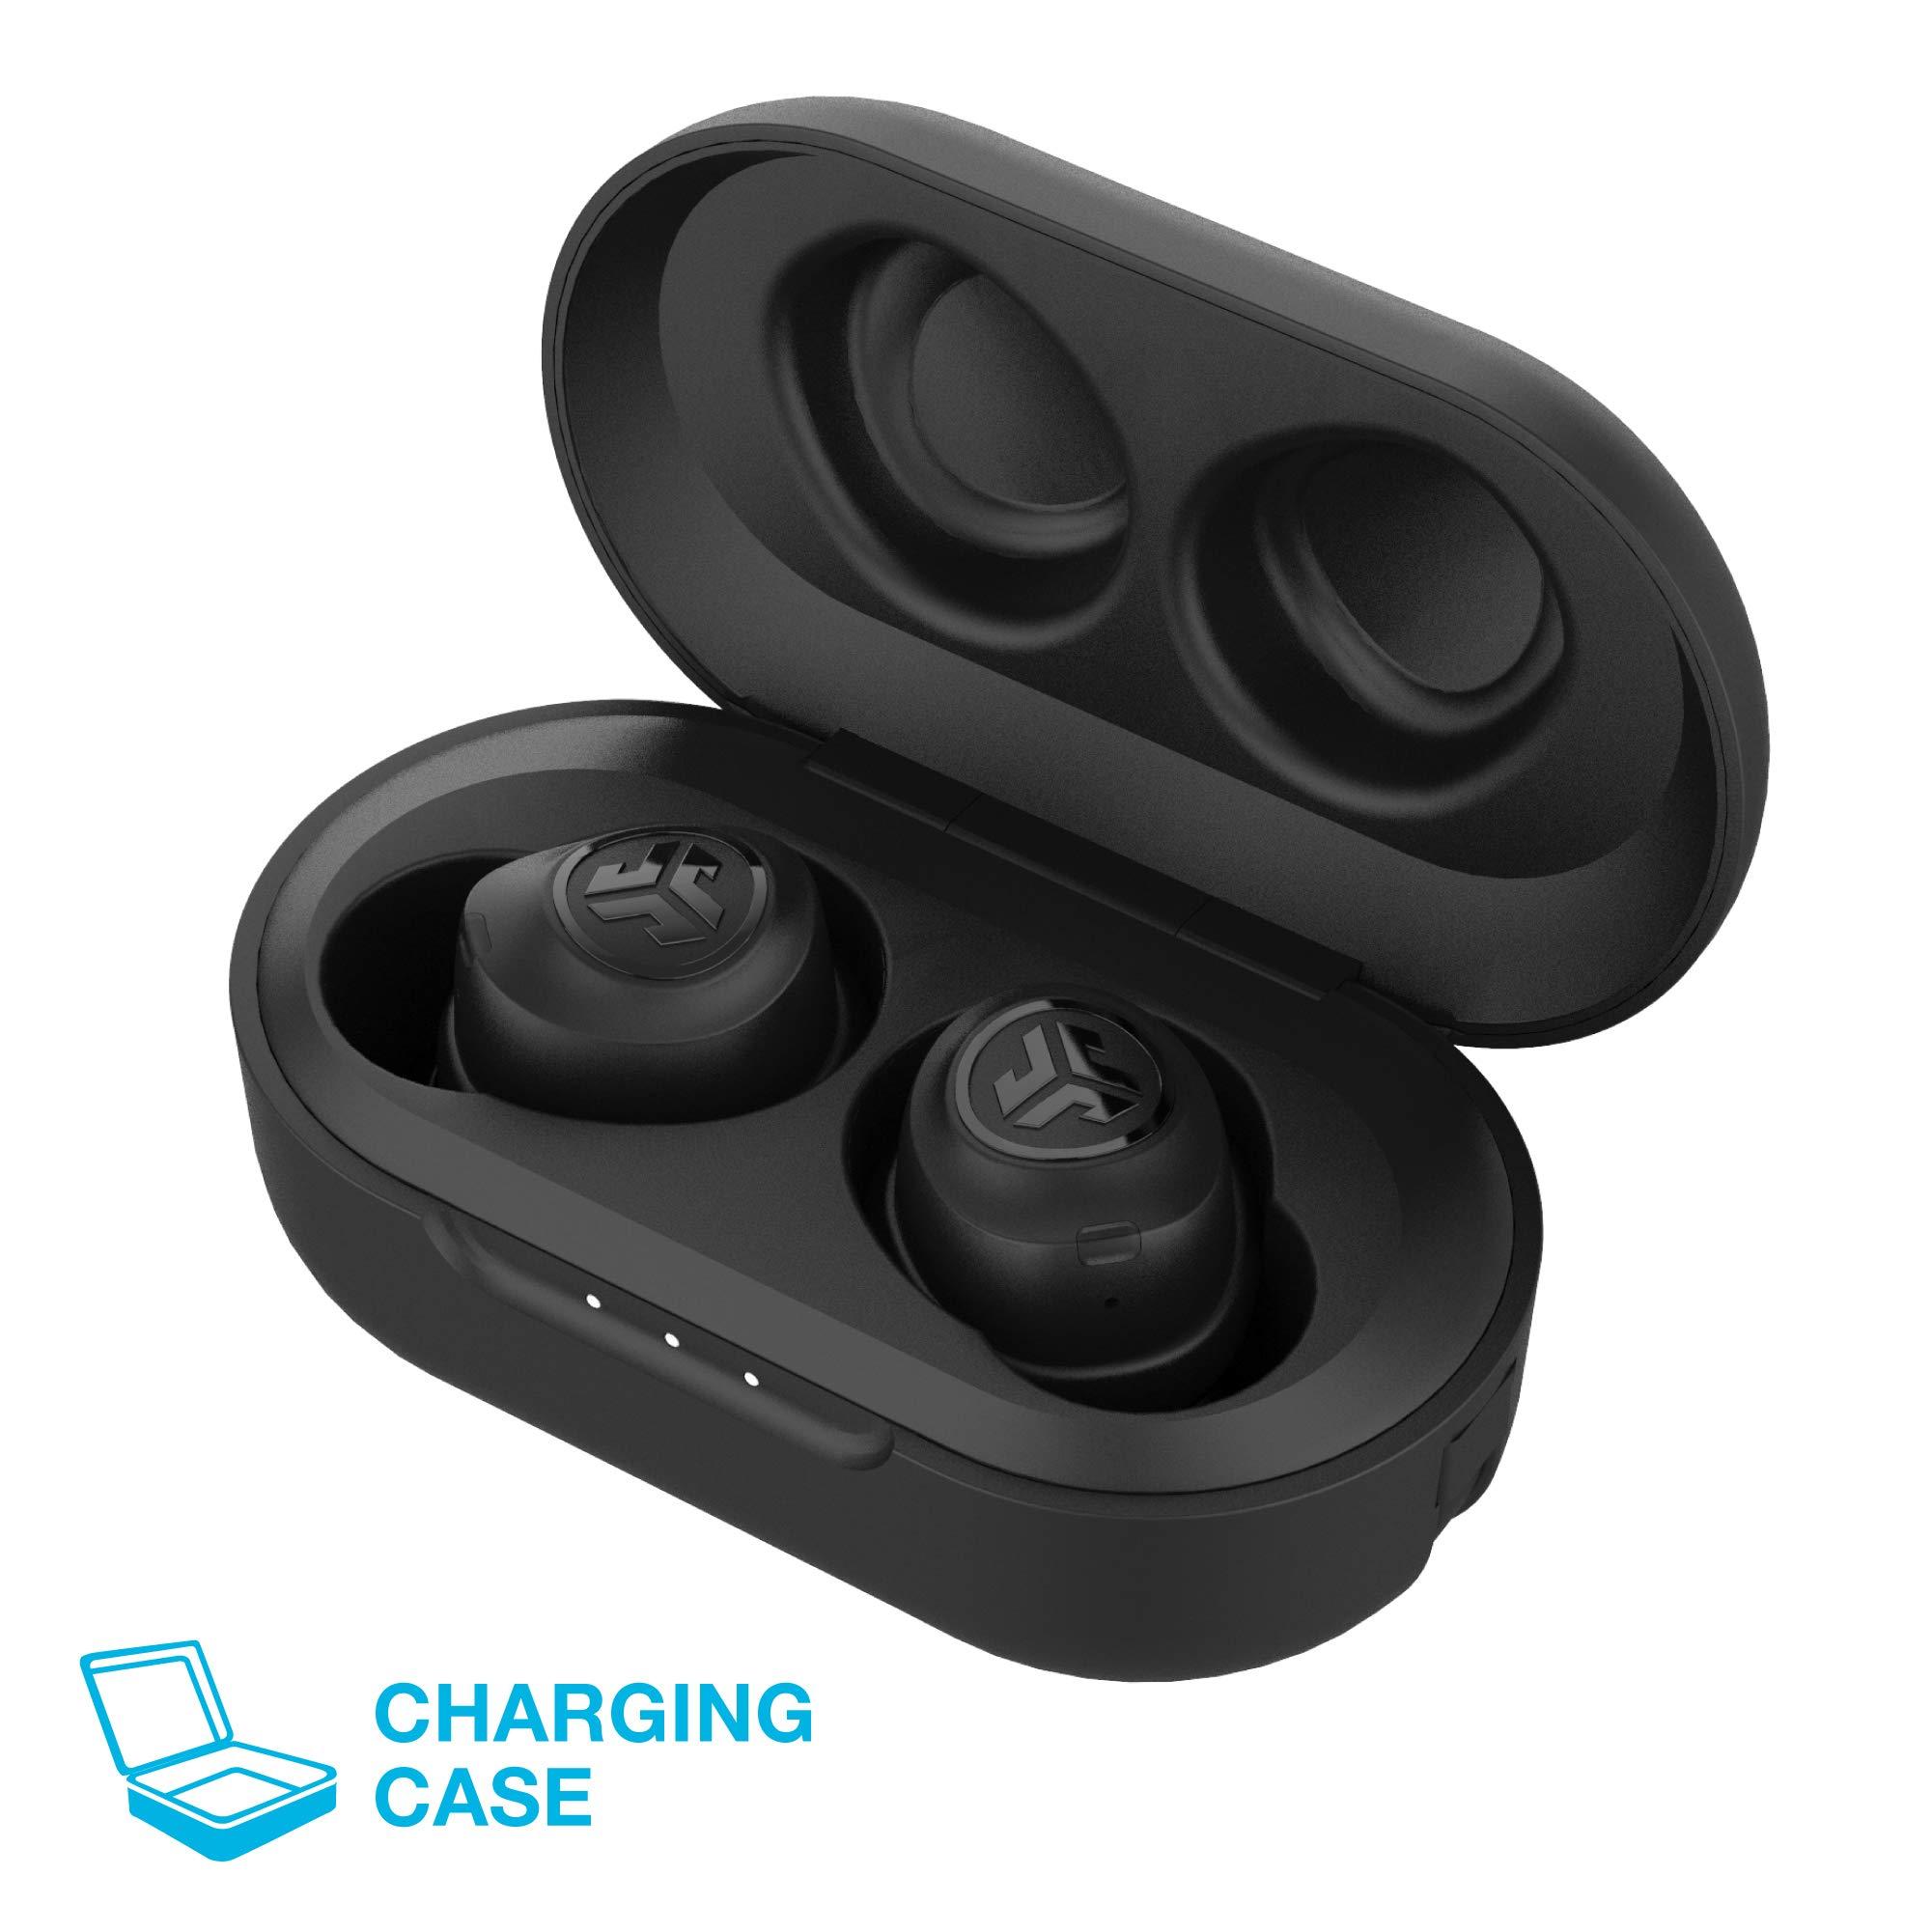 JLab Audio JBuds Air True Wireless Signature Bluetooth Earbuds + Charging Case - Black - IP55 Sweat Resistance - Bluetooth 5.0 Connection - 3 EQ Sound Settings: JLab Signature, Balanced, Bass Boost by JLAB (Image #3)